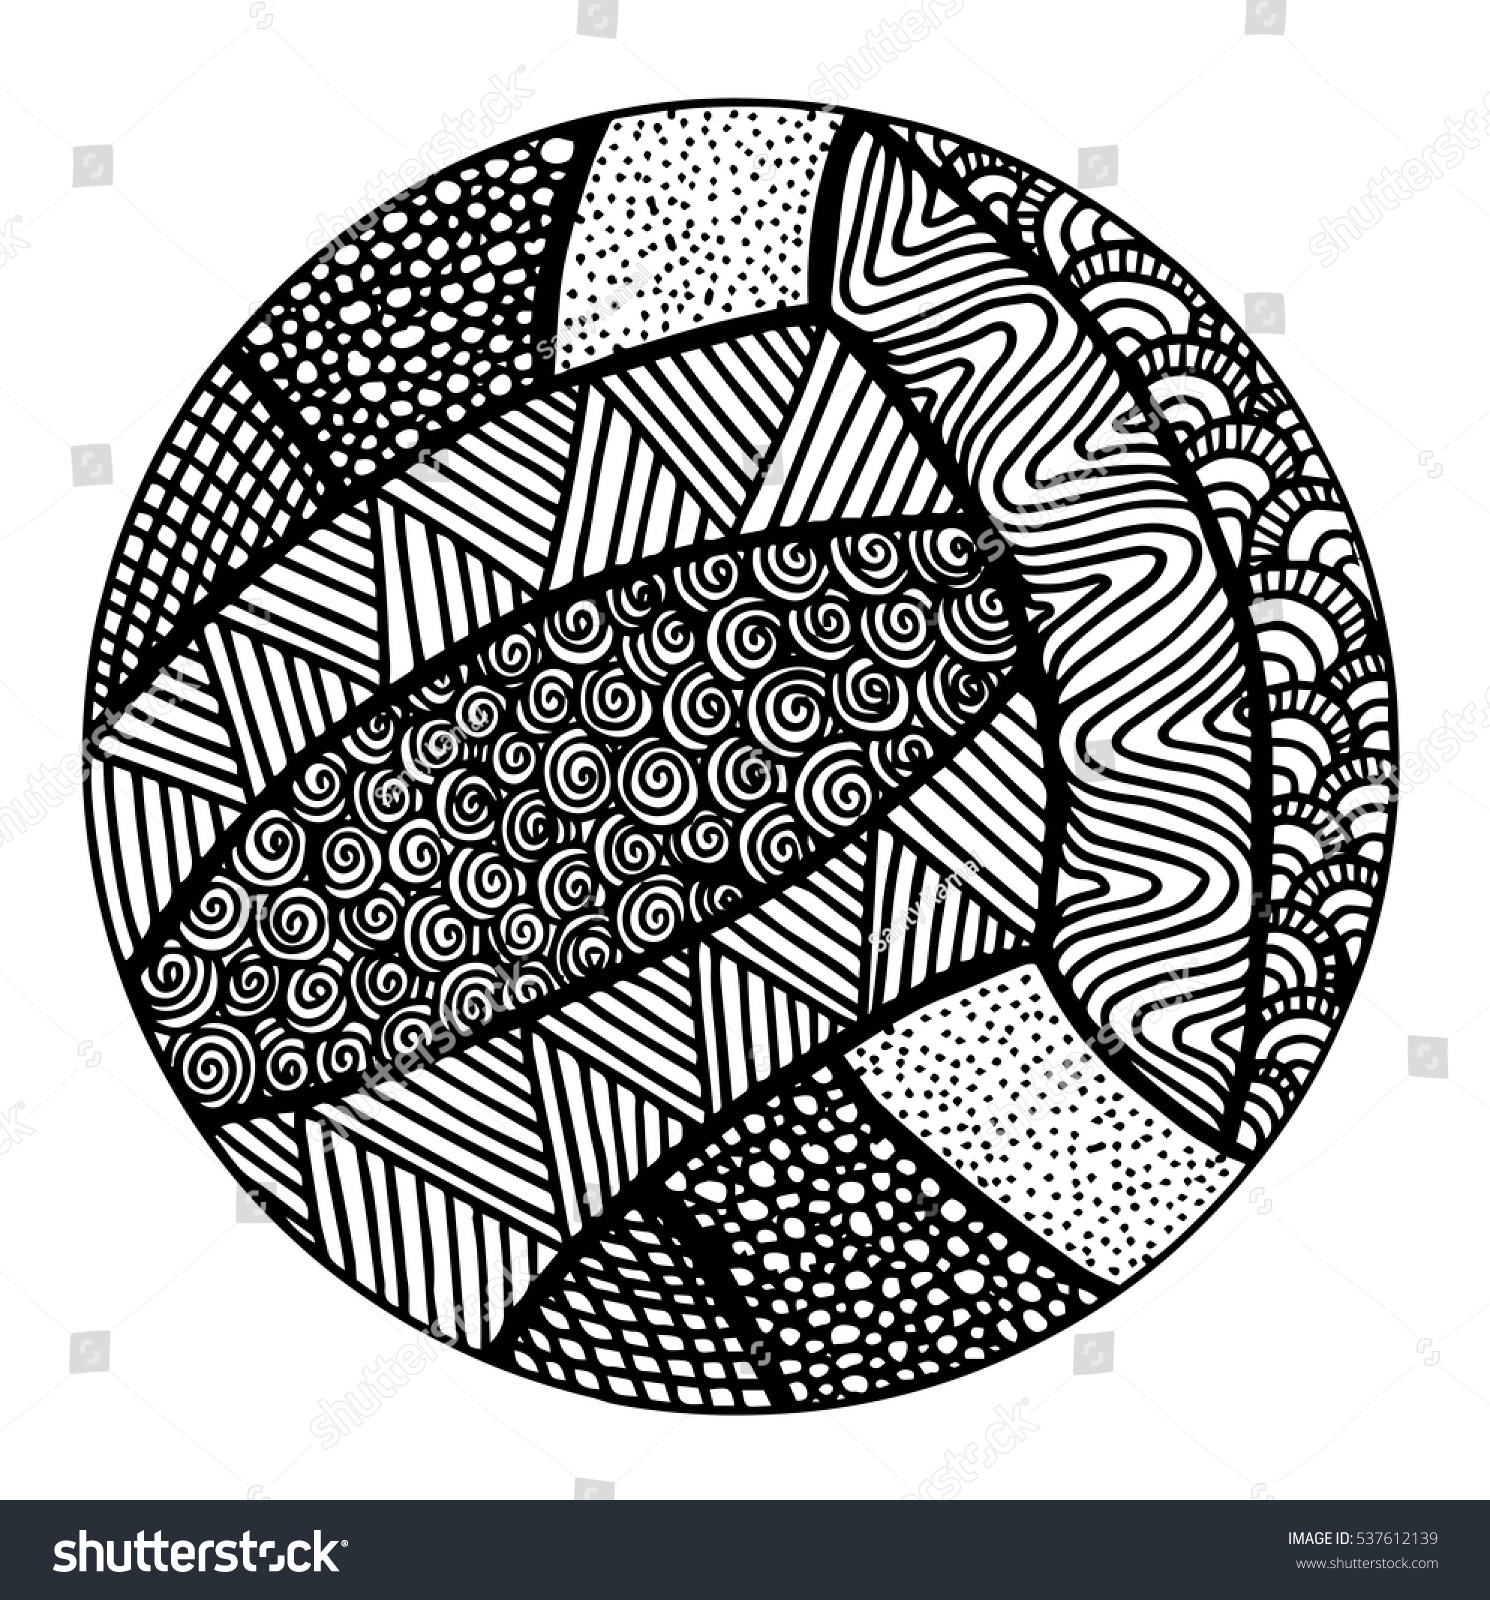 Hand Drawn Volleyball Illustration Stock Vector